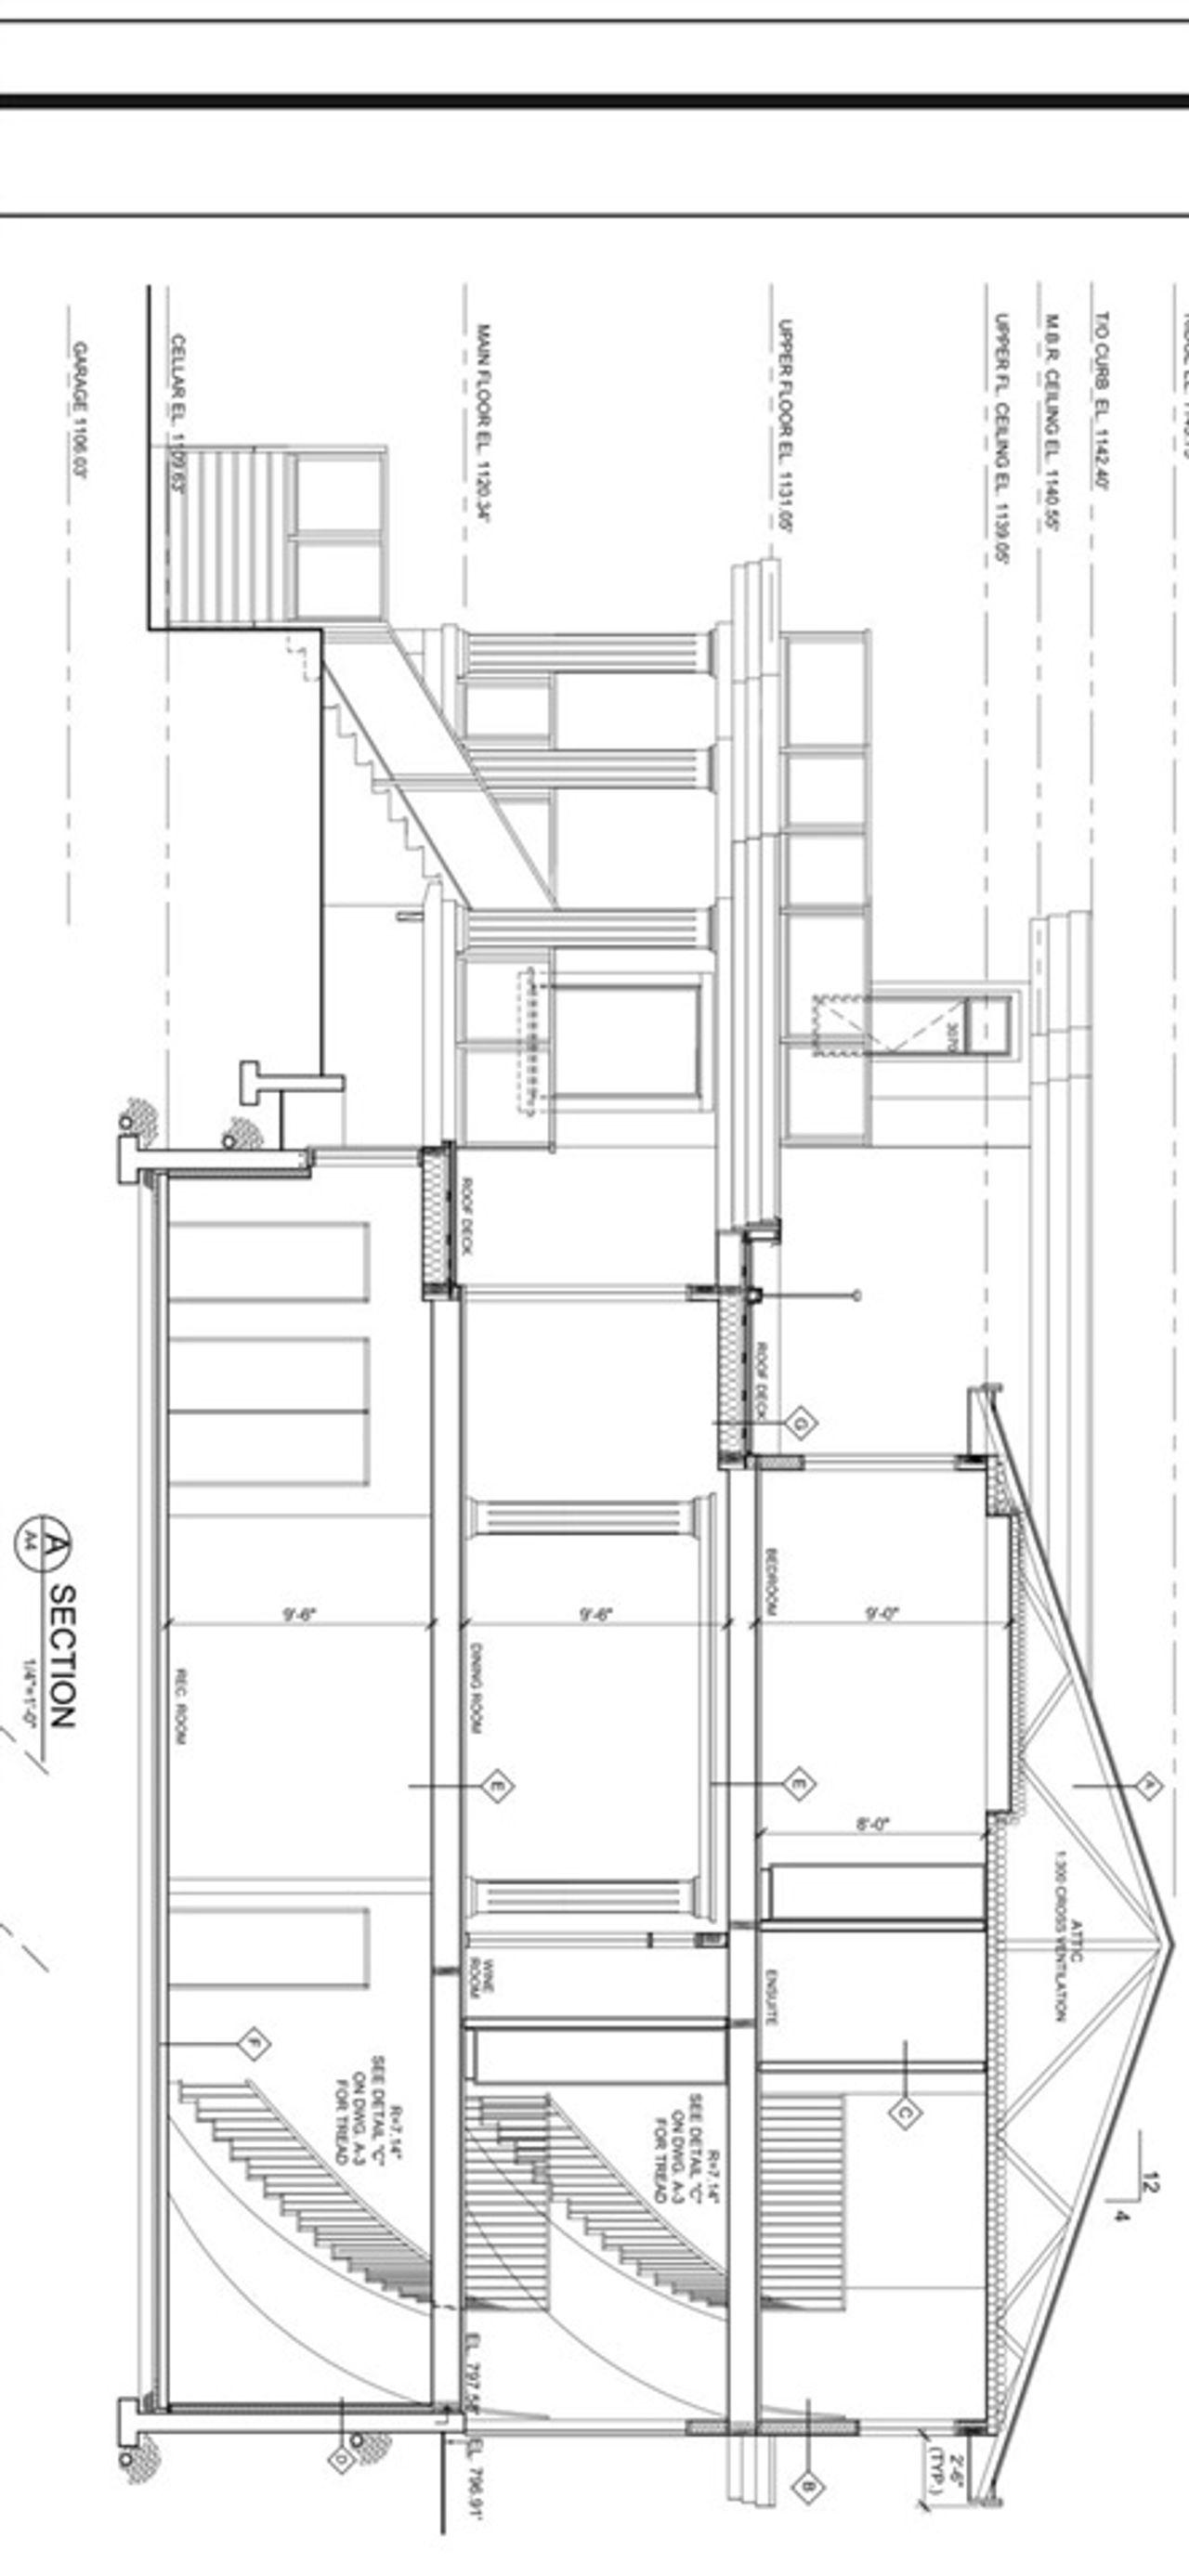 1046-millstream-road-british-properties-west-vancouver-07 at 1046 Millstream Road, British Properties, West Vancouver